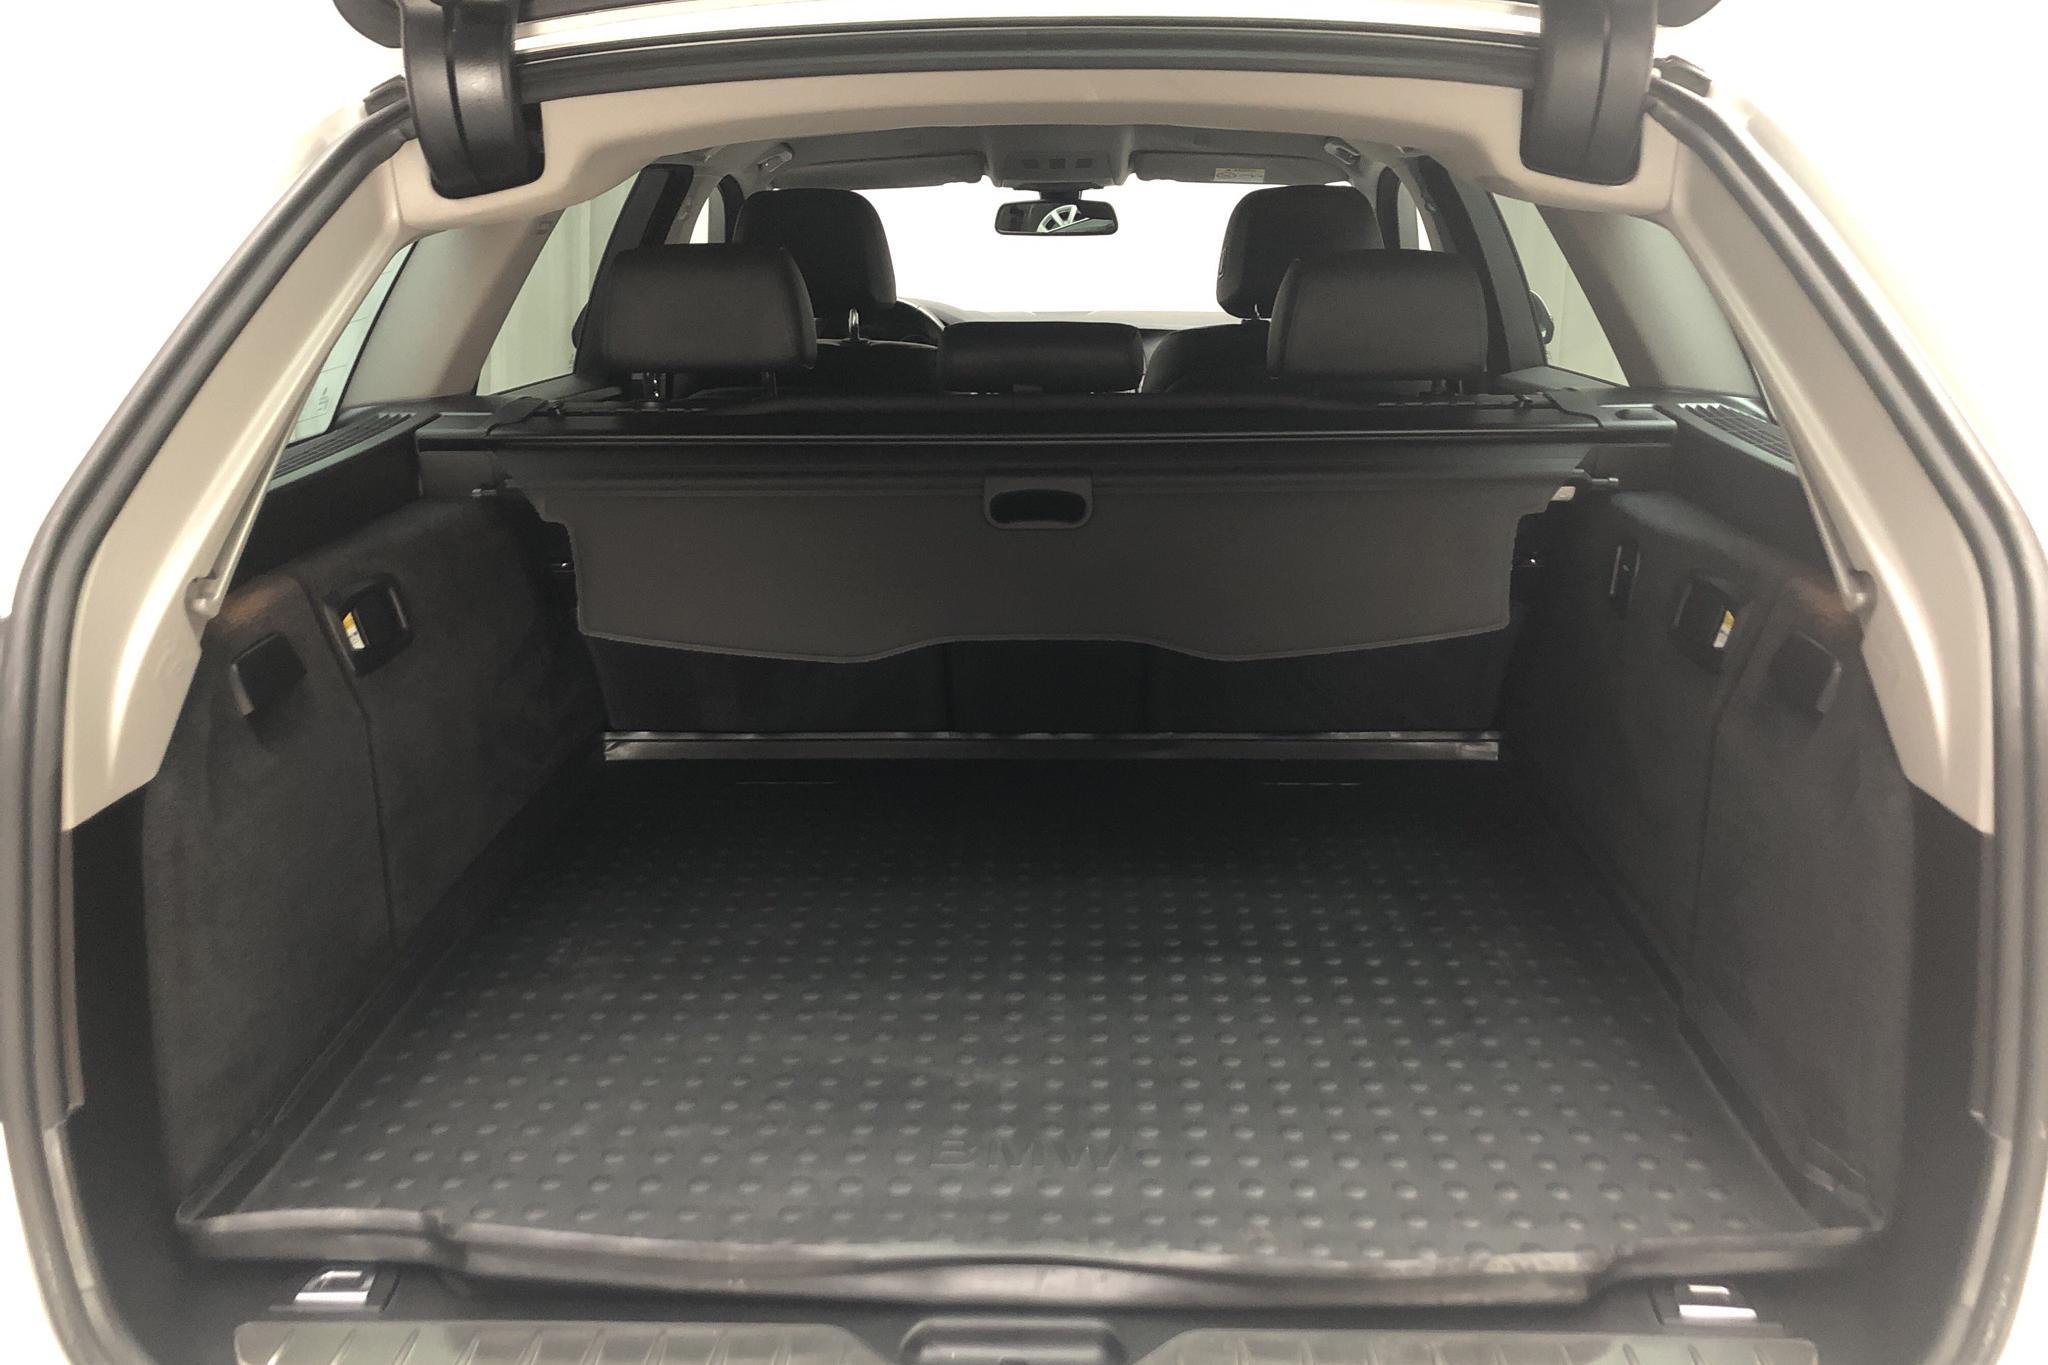 BMW 520d xDrive Touring, F11 (190hk) - 10 515 mil - Automat - vit - 2017